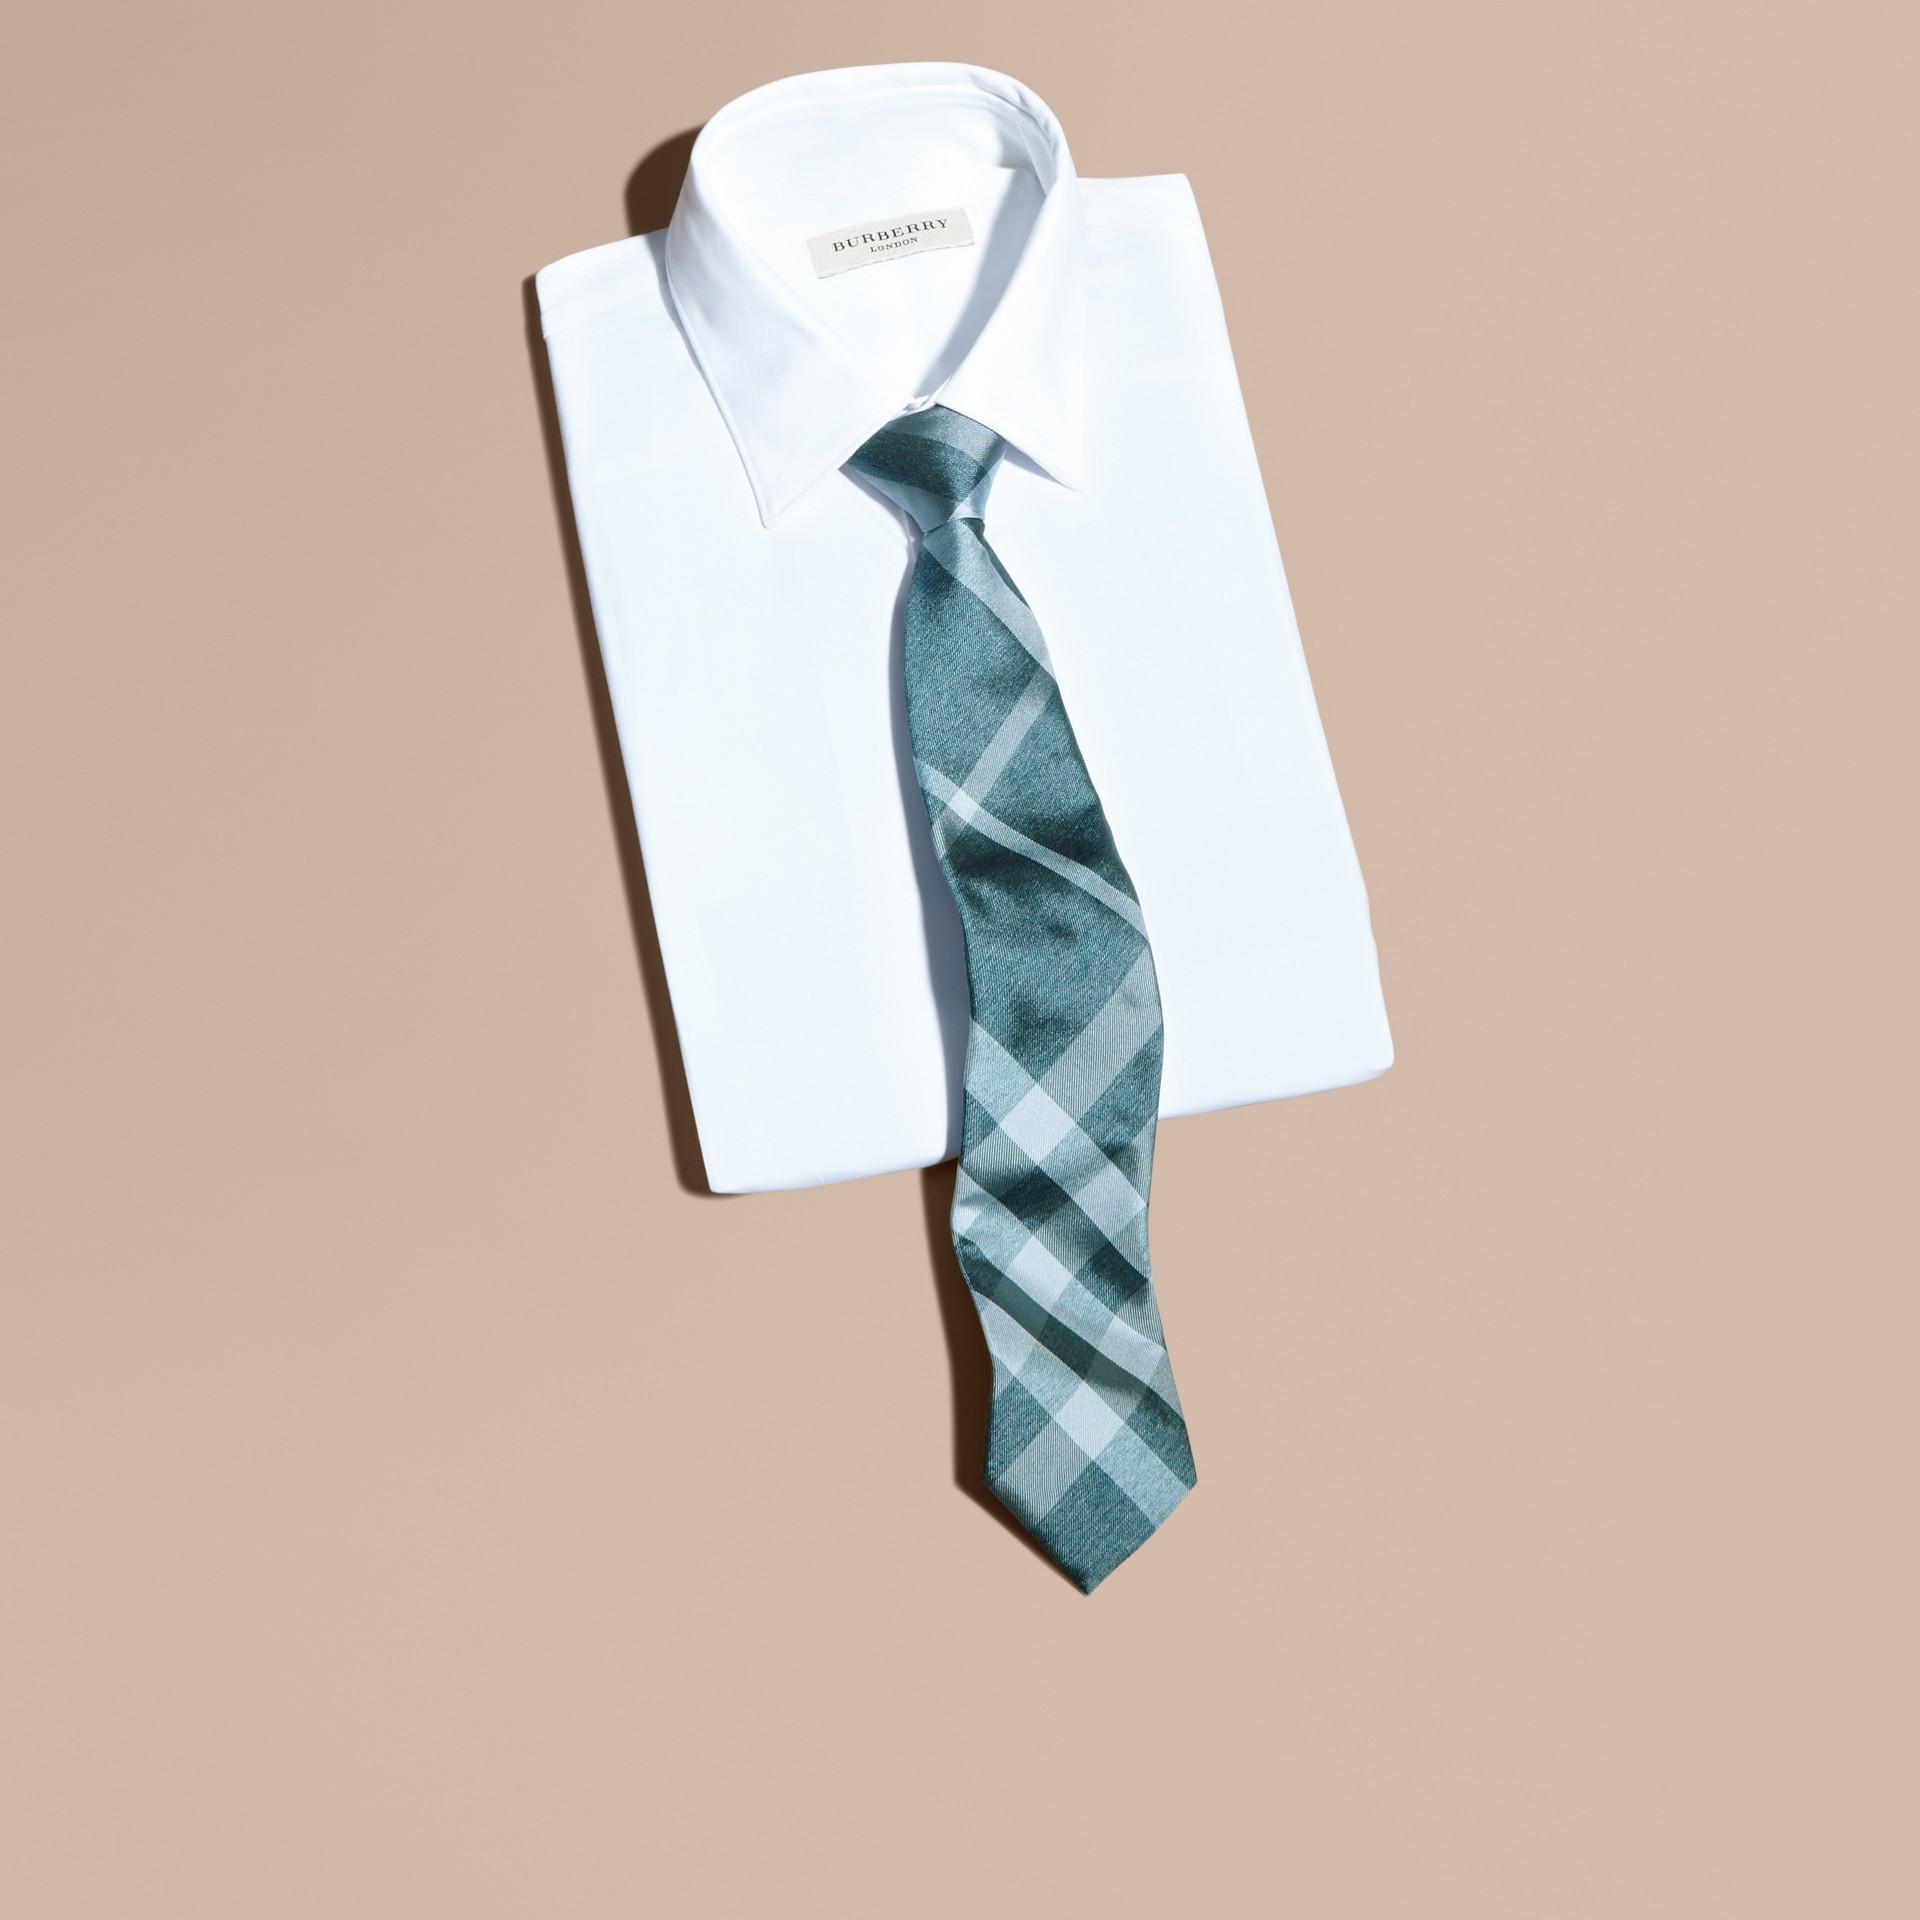 Aqua green Modern Cut Check Jacquard Silk Tie Aqua Green - gallery image 3